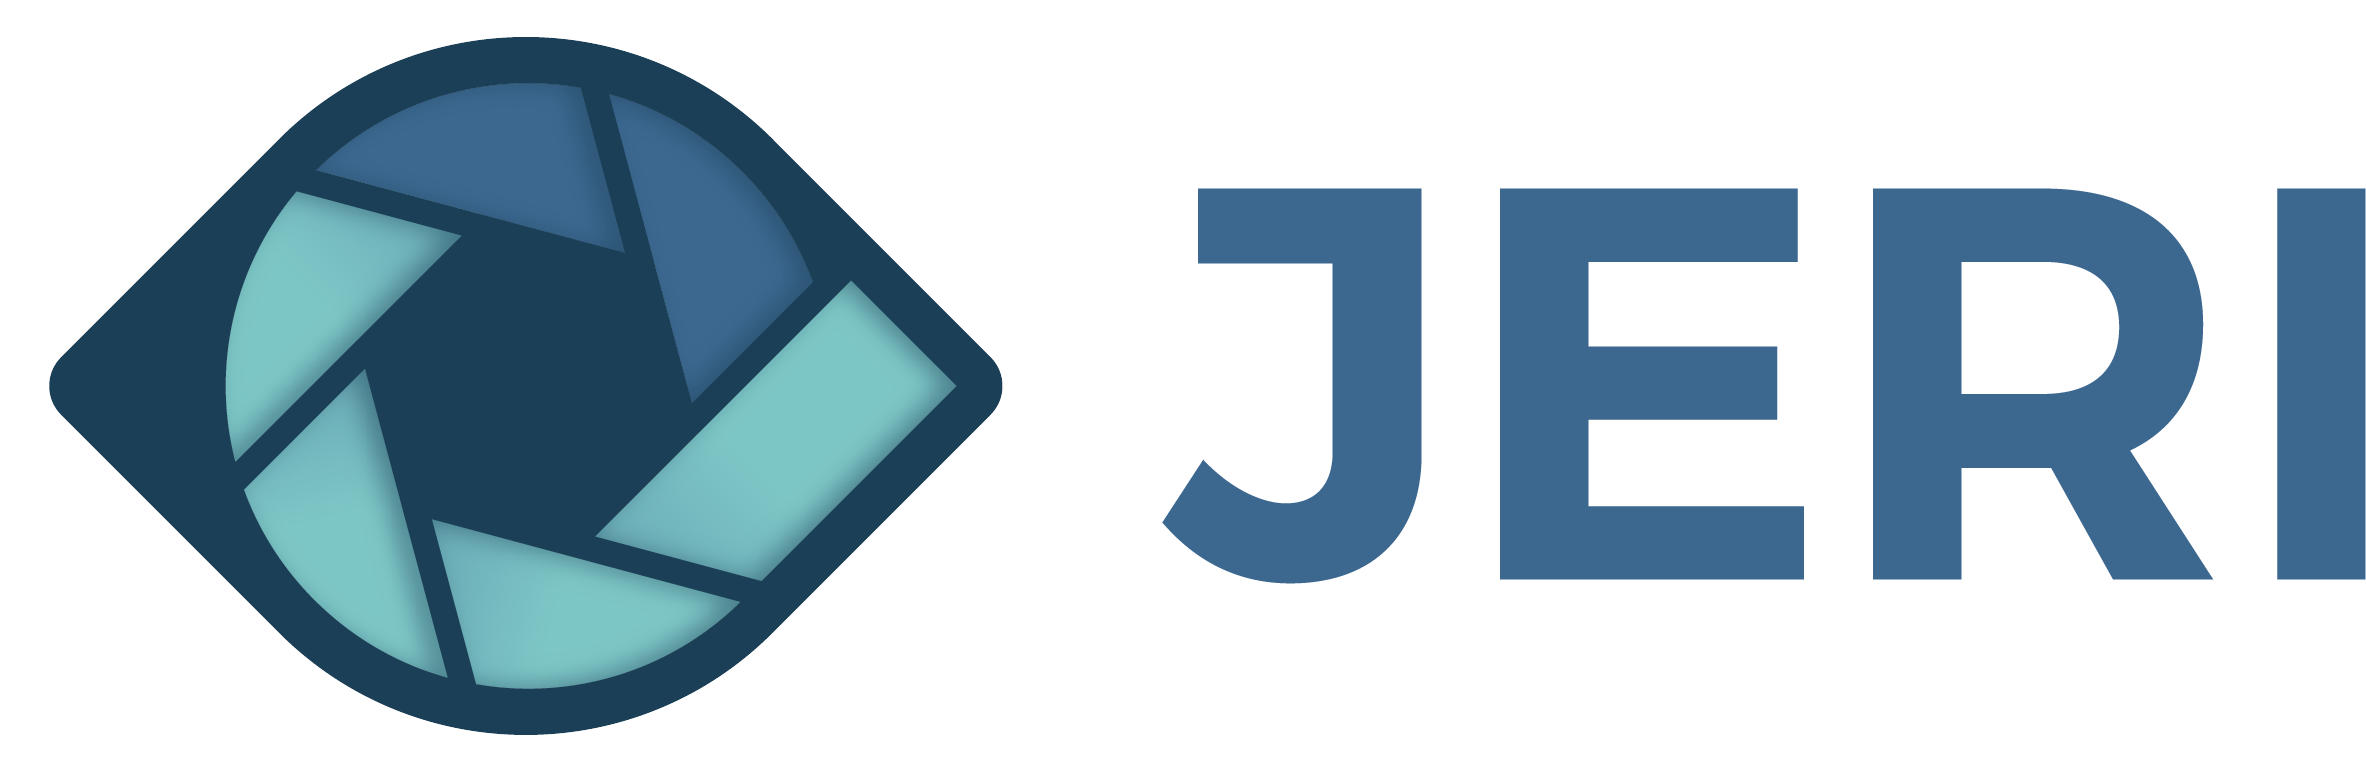 JERI: JavaScript Extended Range ImageViewer